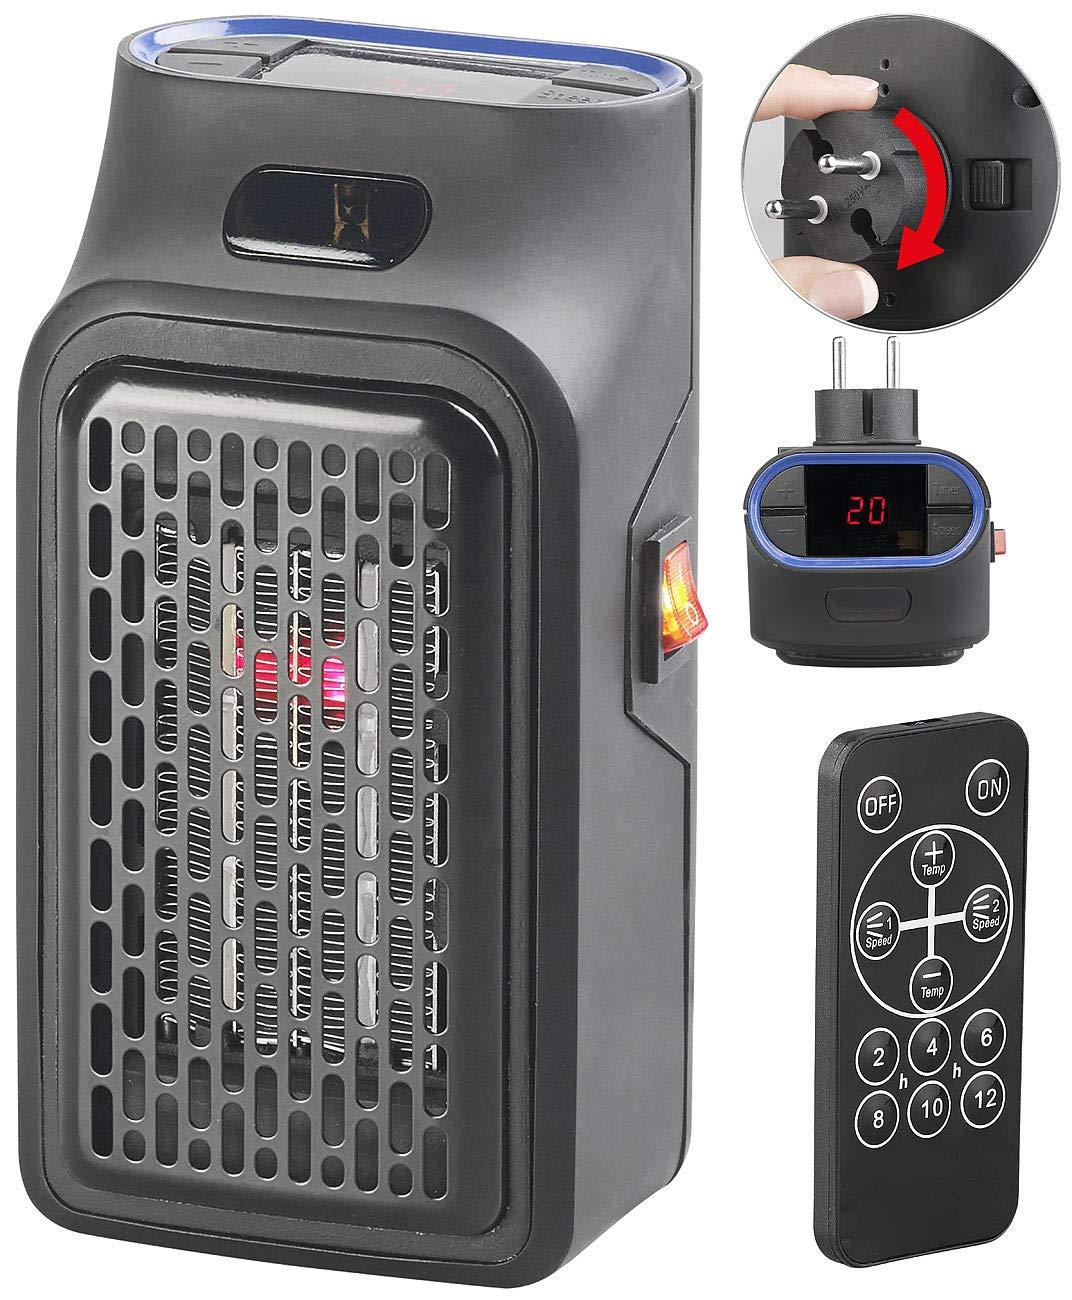 Sichler Haushaltsgerä te Handy Heater: Mini-Steckdosen-Heizlü fter mit Timer & Fernbedienung, 2-stufig, 500 W (Mini Heizer) Sichler Haushaltsgeräte